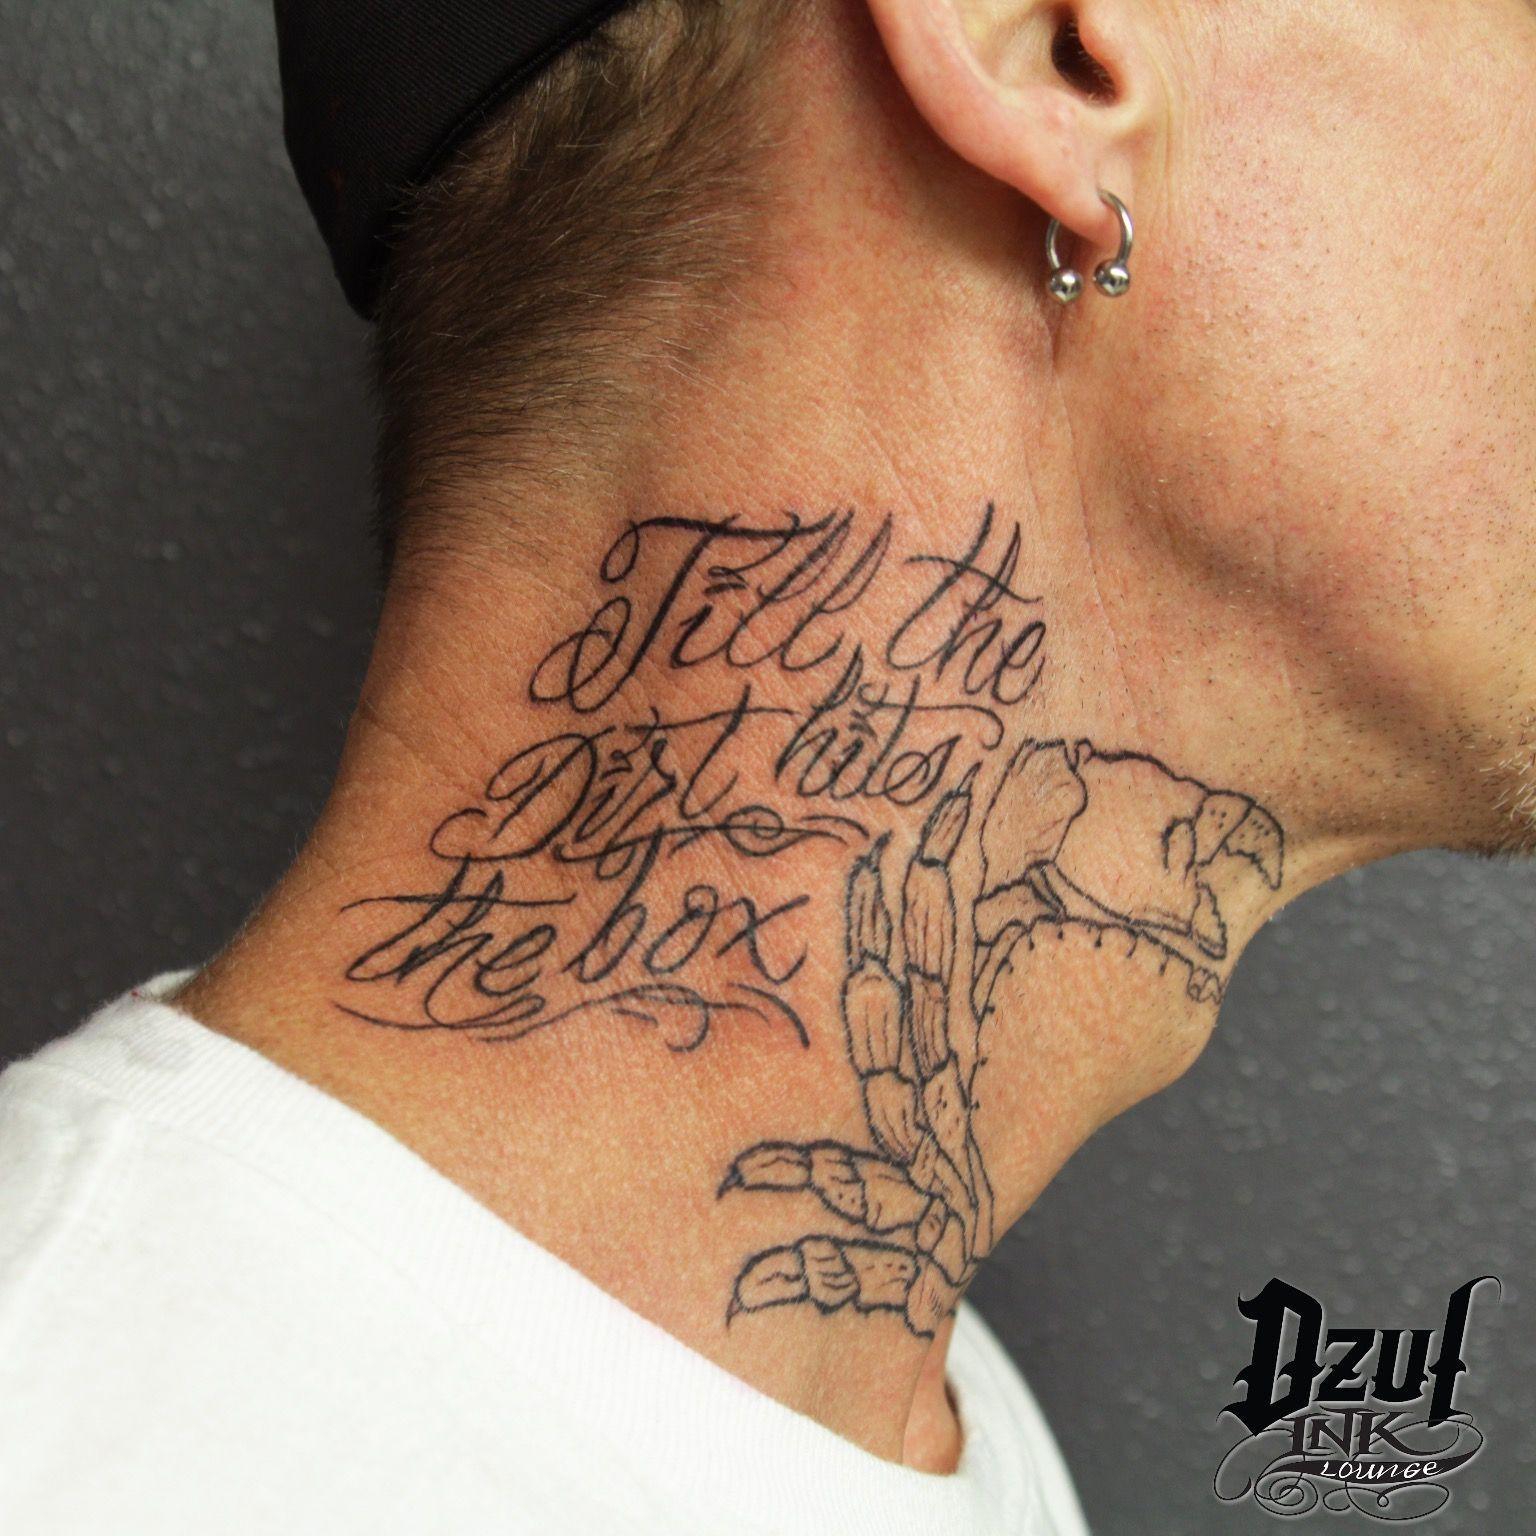 """Till The Dirt Hits The Box"" 🦀Neck Tattoo Progress By Alex"